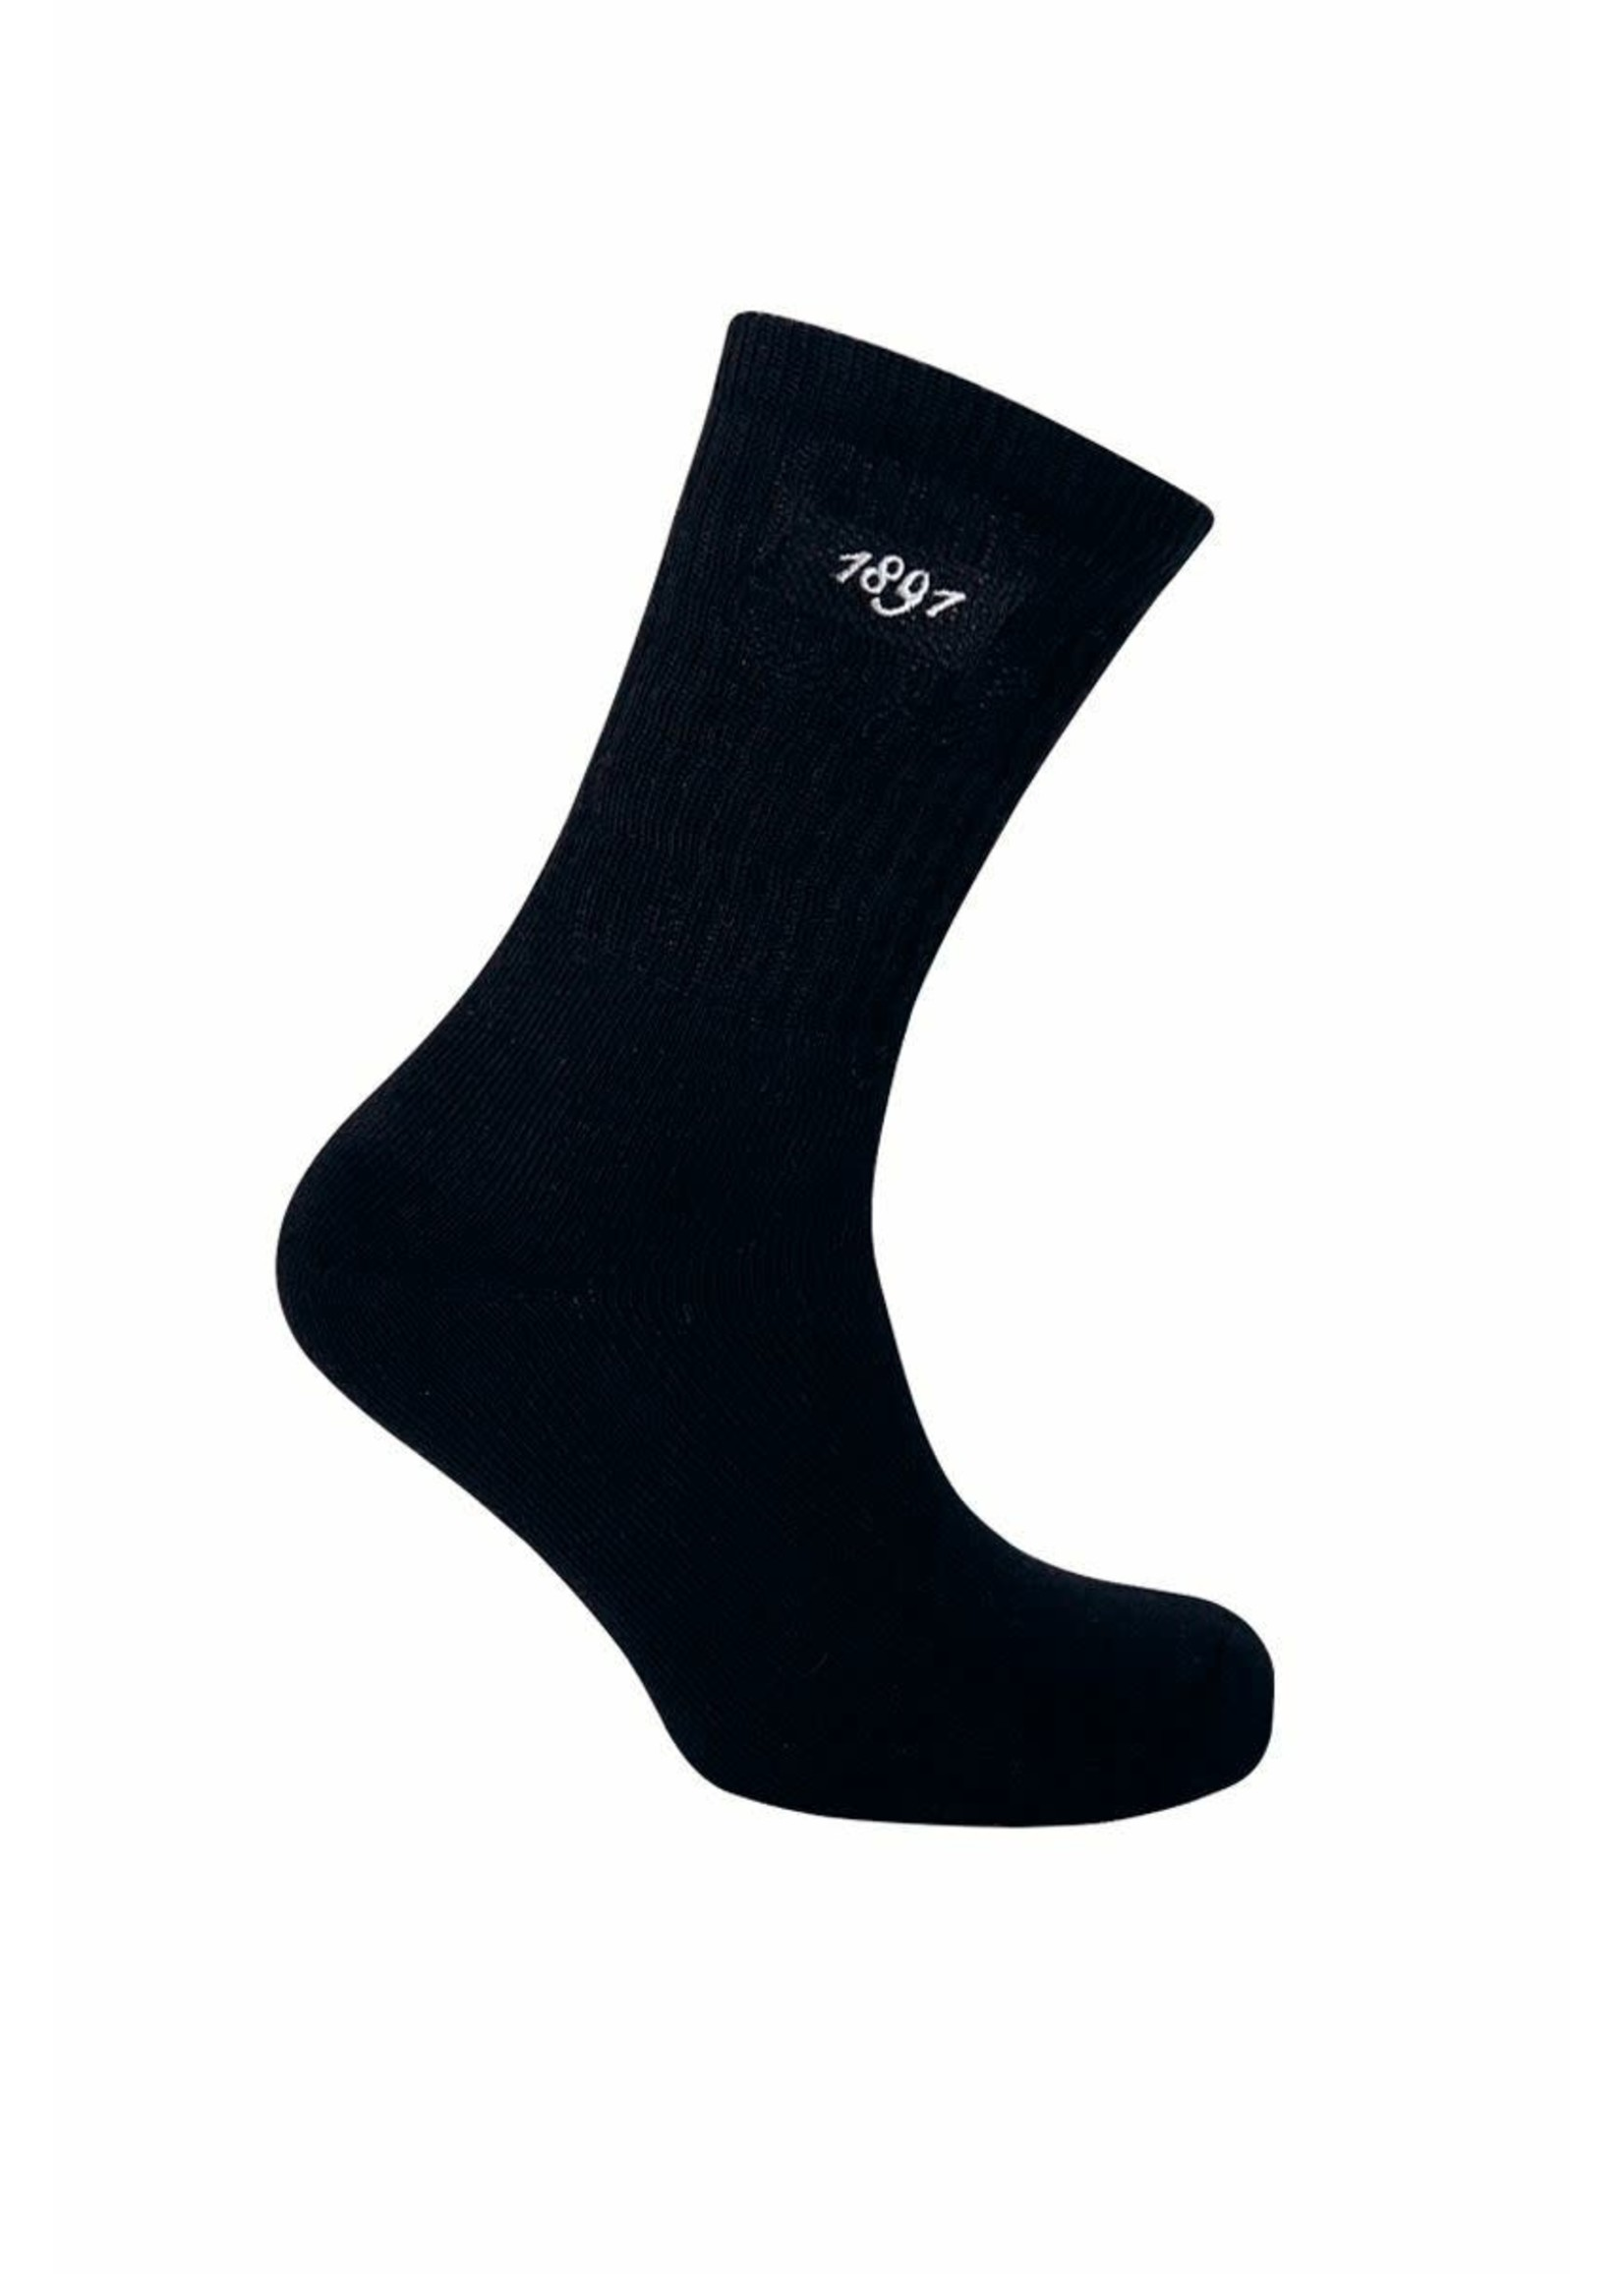 Glenmuir Glenmuir 1891 Dunbar Performance Socks